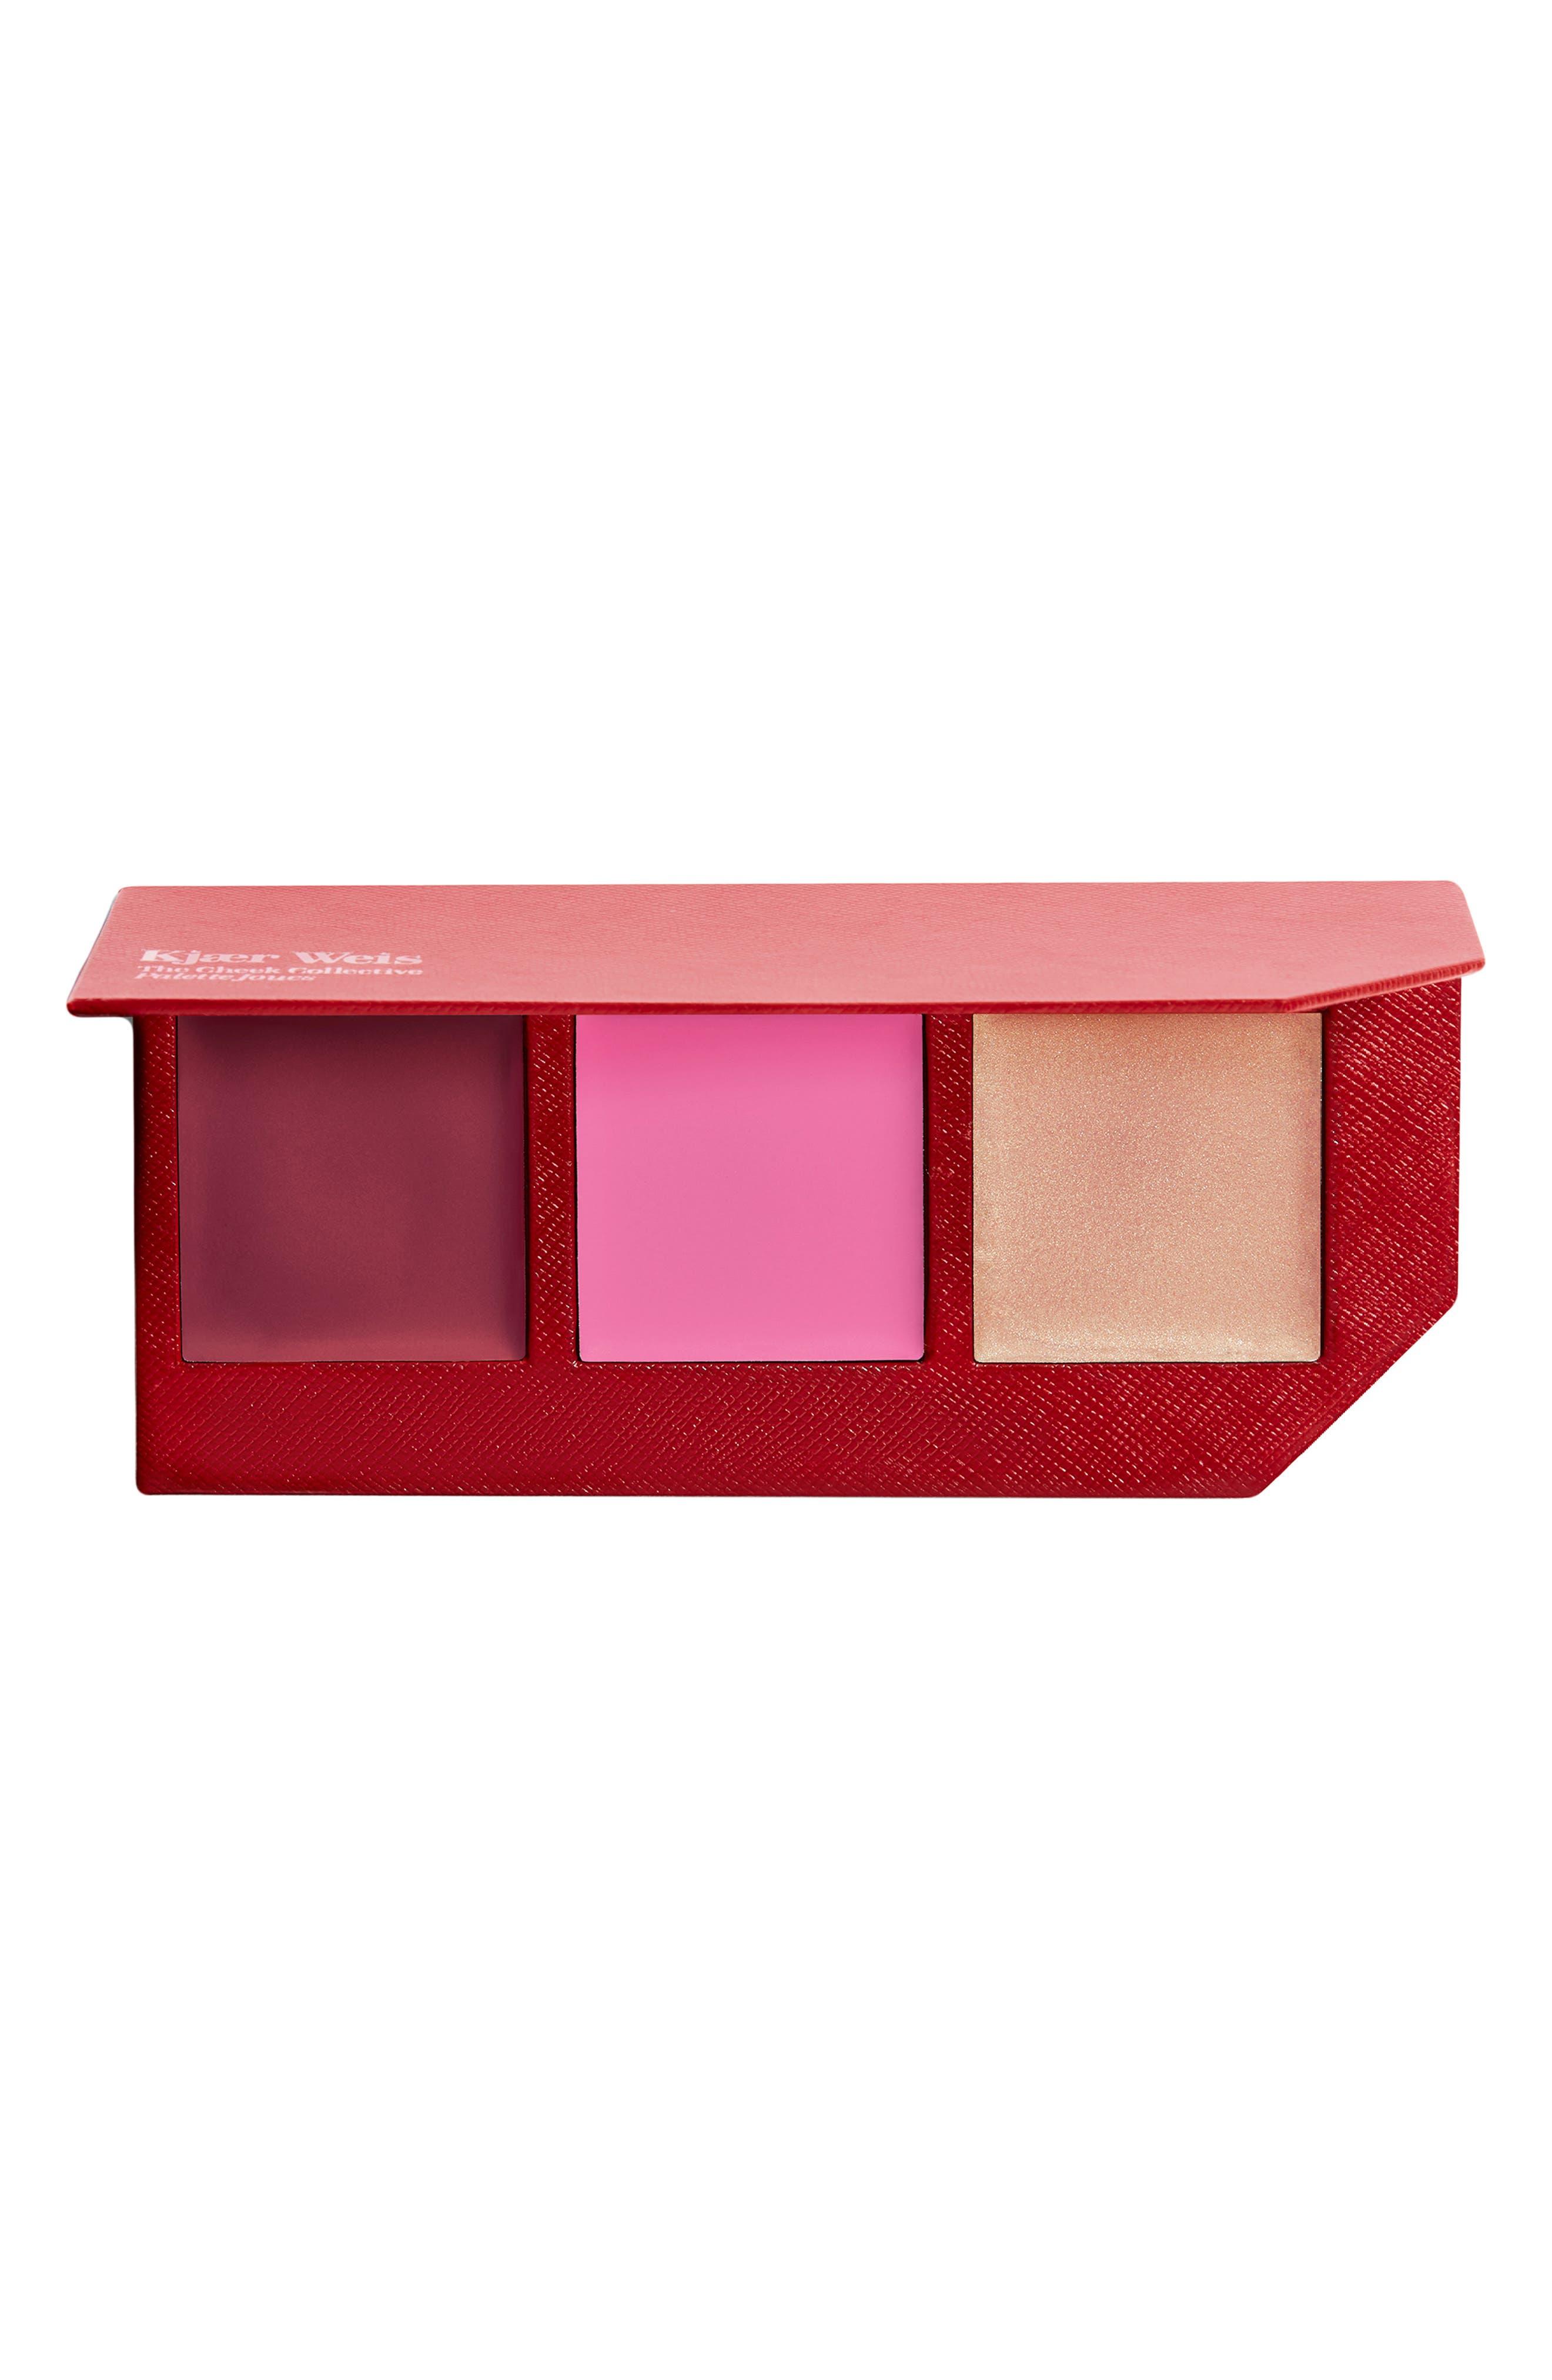 The Cheek Collective Cream Blush & Cream Glow Highlighter Palette